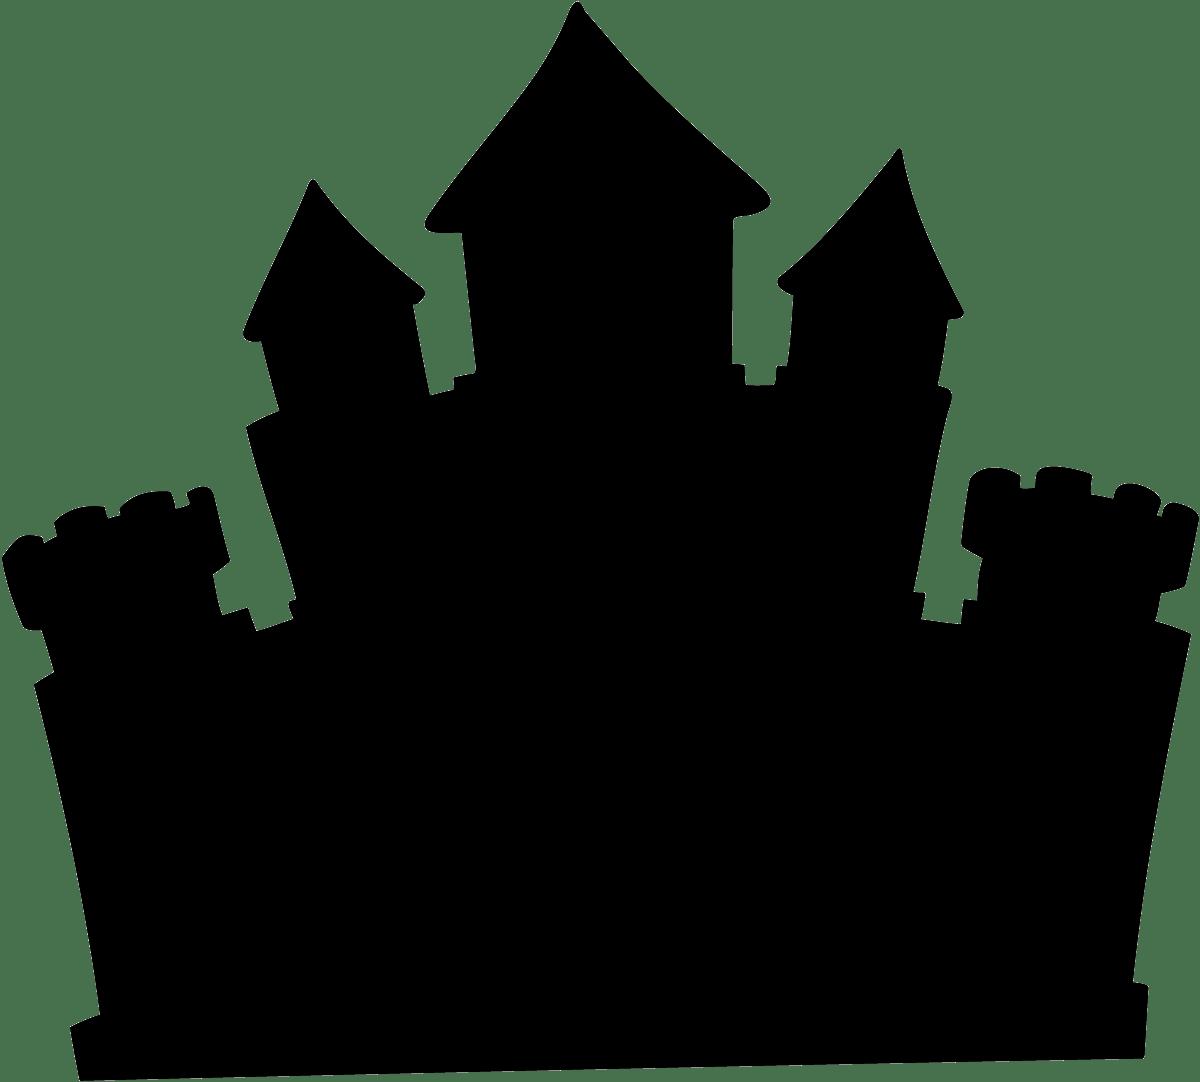 pizarra con la silueta de un castillo encantado disney halloween characters clipart disney halloween clip art pumpkin